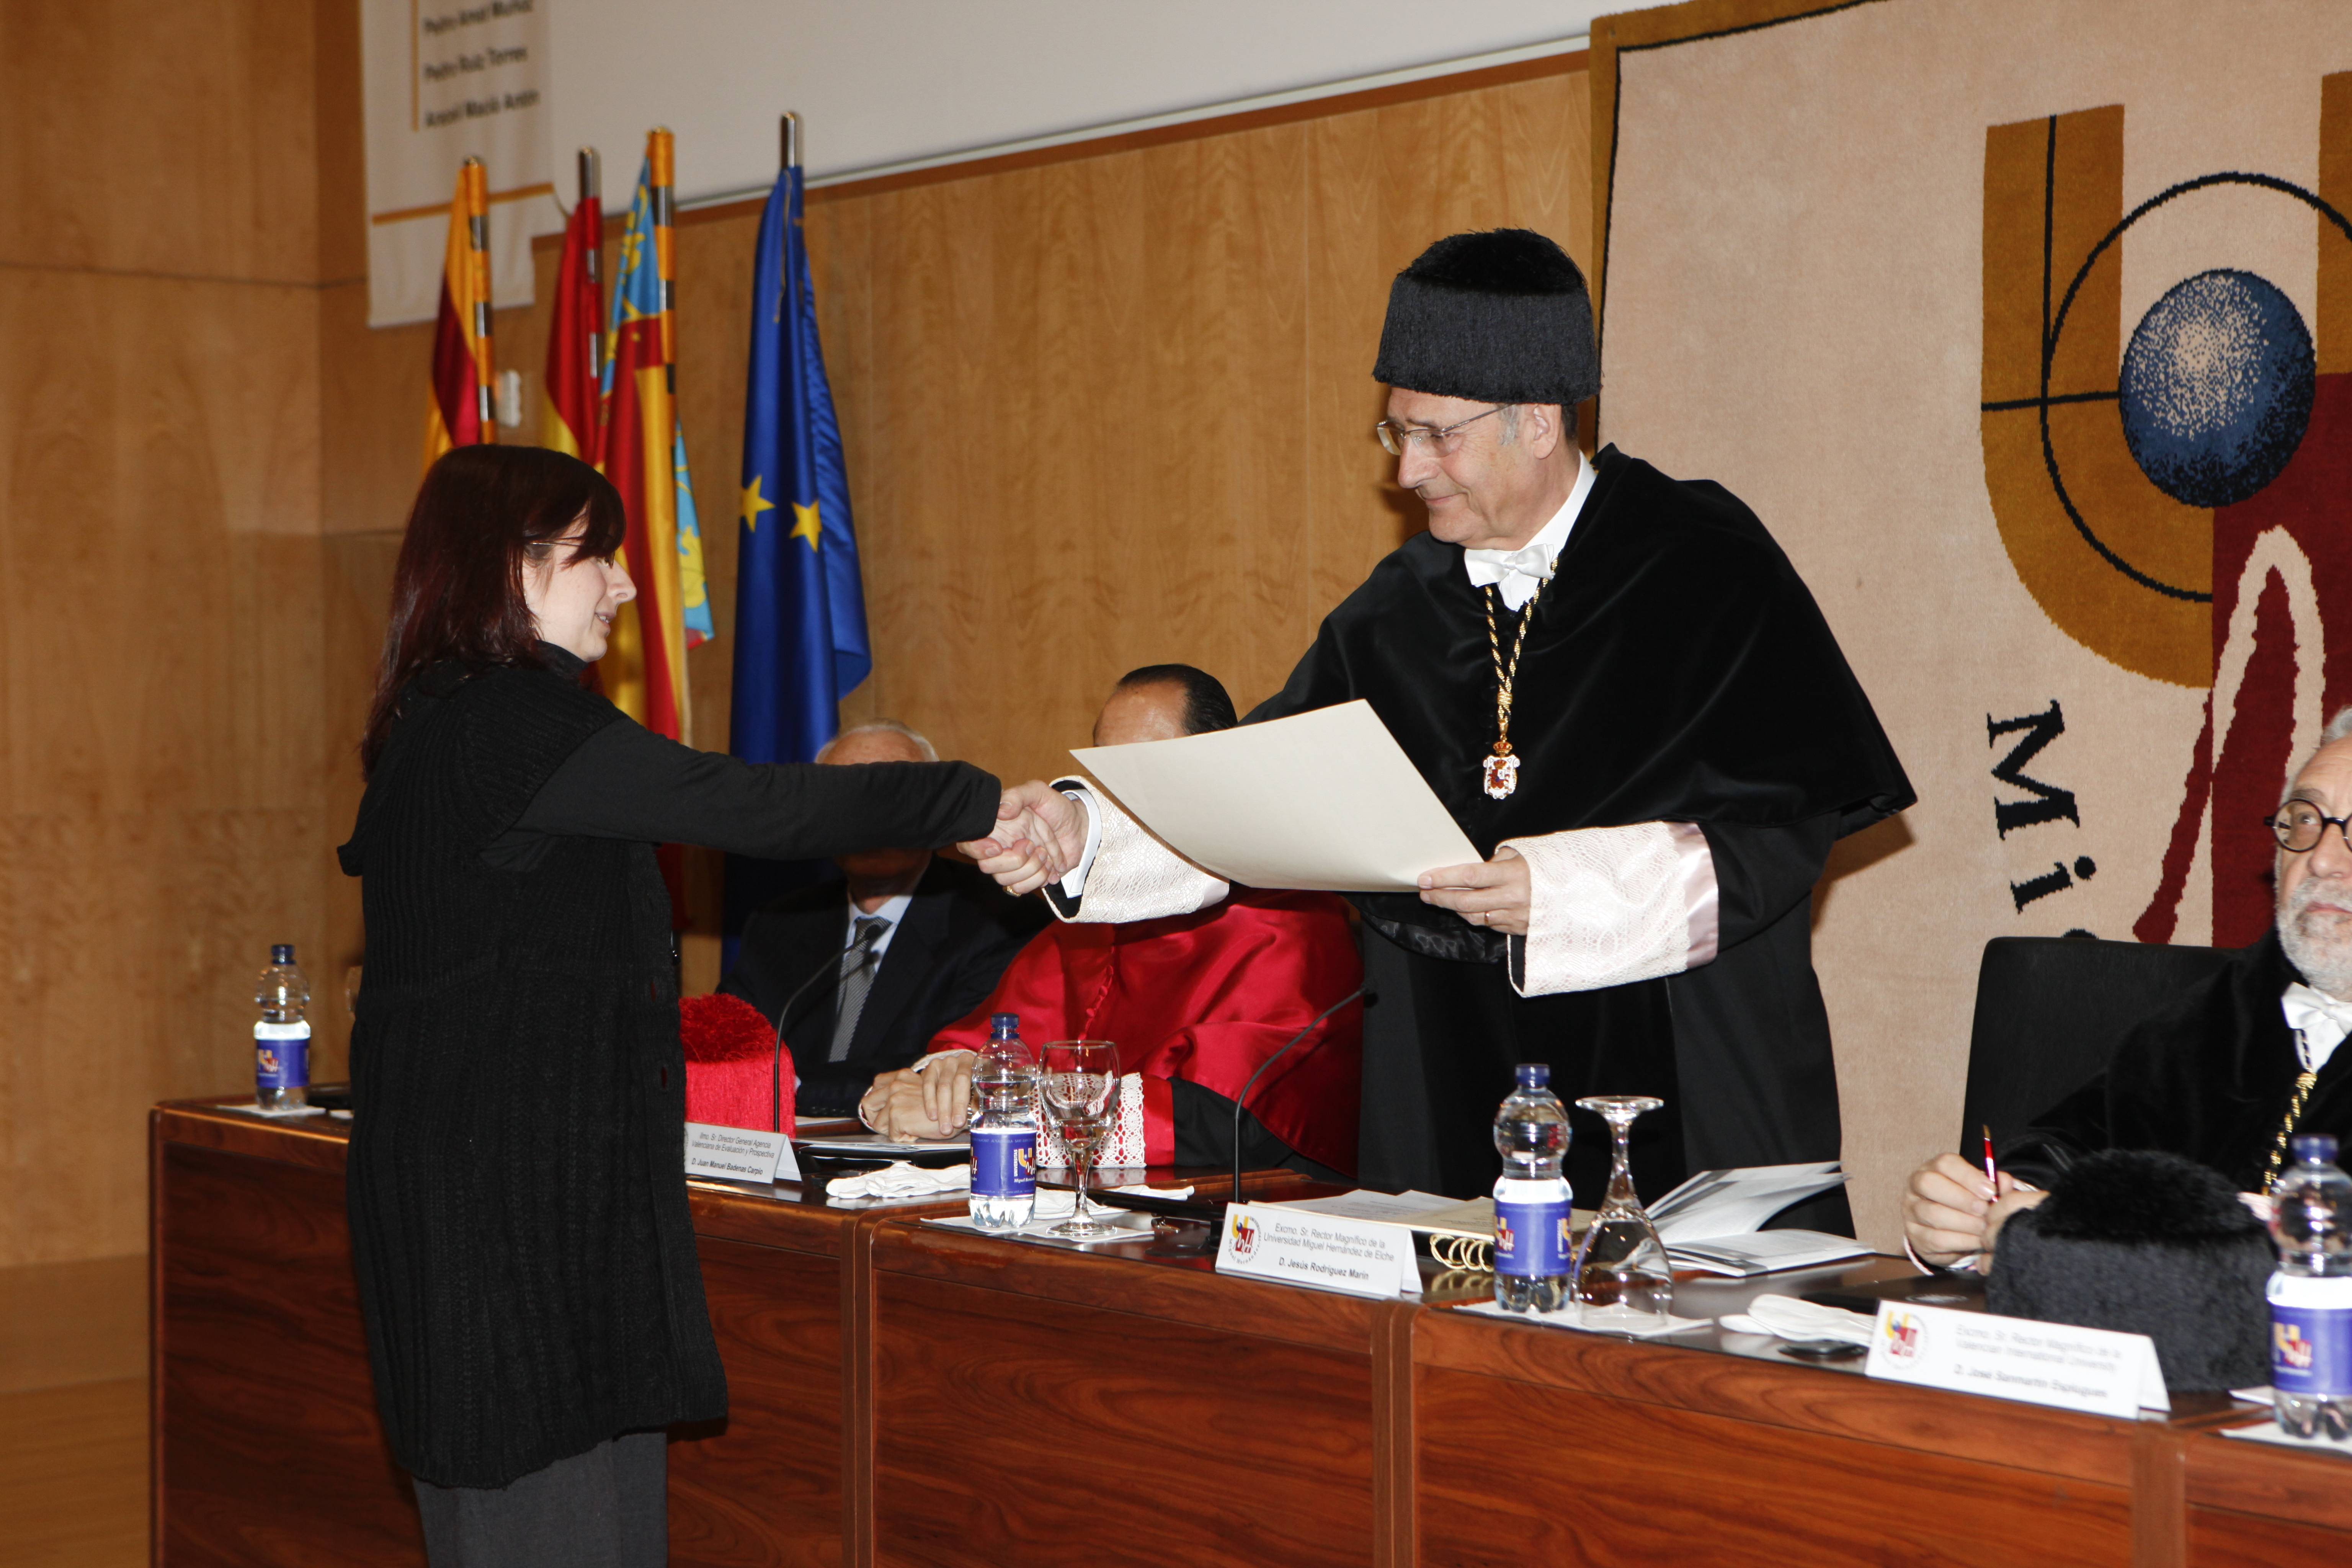 doctor-honoris-causa-luis-gamir_mg_0918.jpg